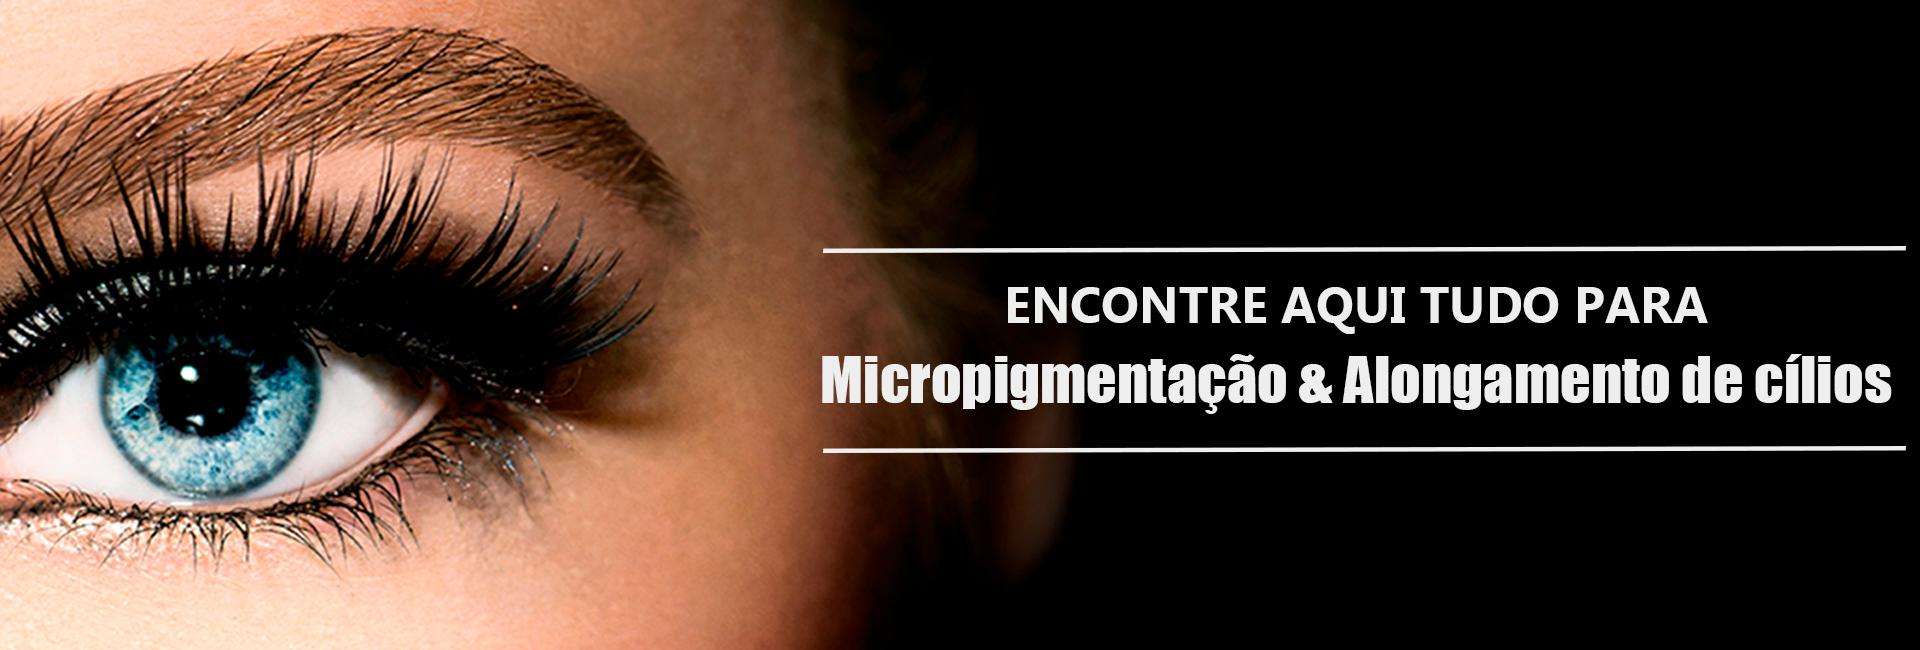 micropigmentacao-e-alongamento-de-cilios